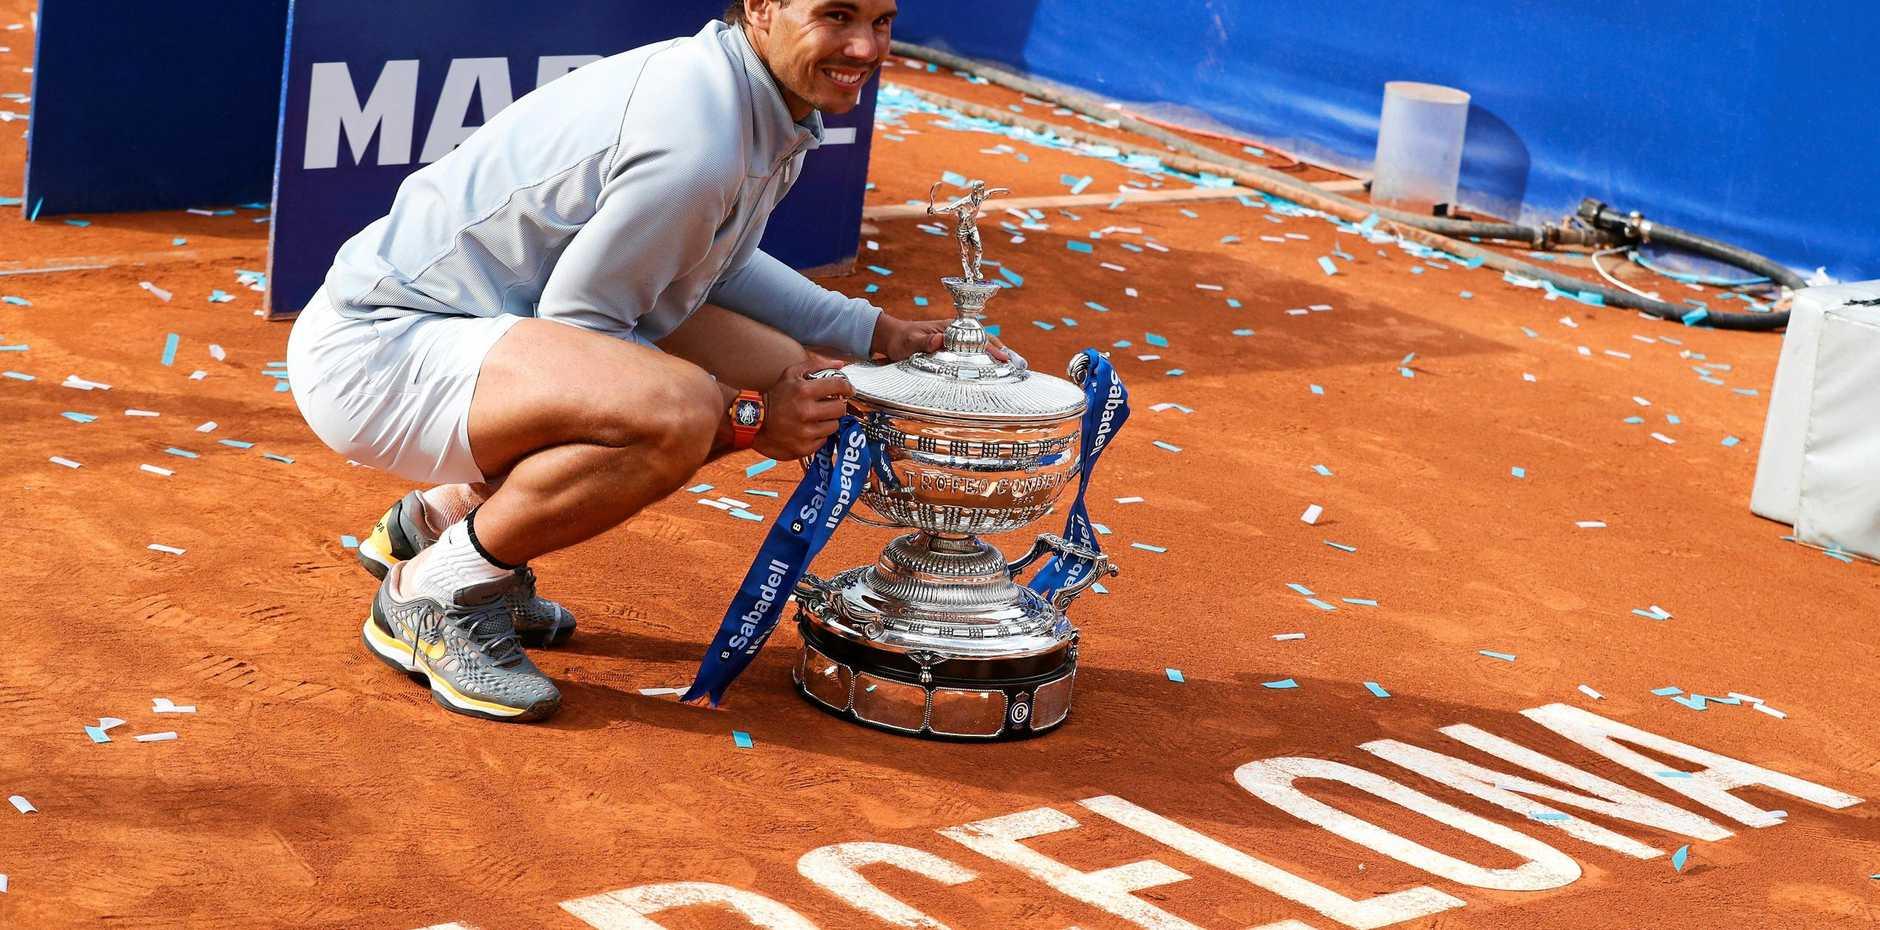 Rafael Nadal celebrates after winning the Barcelona Open